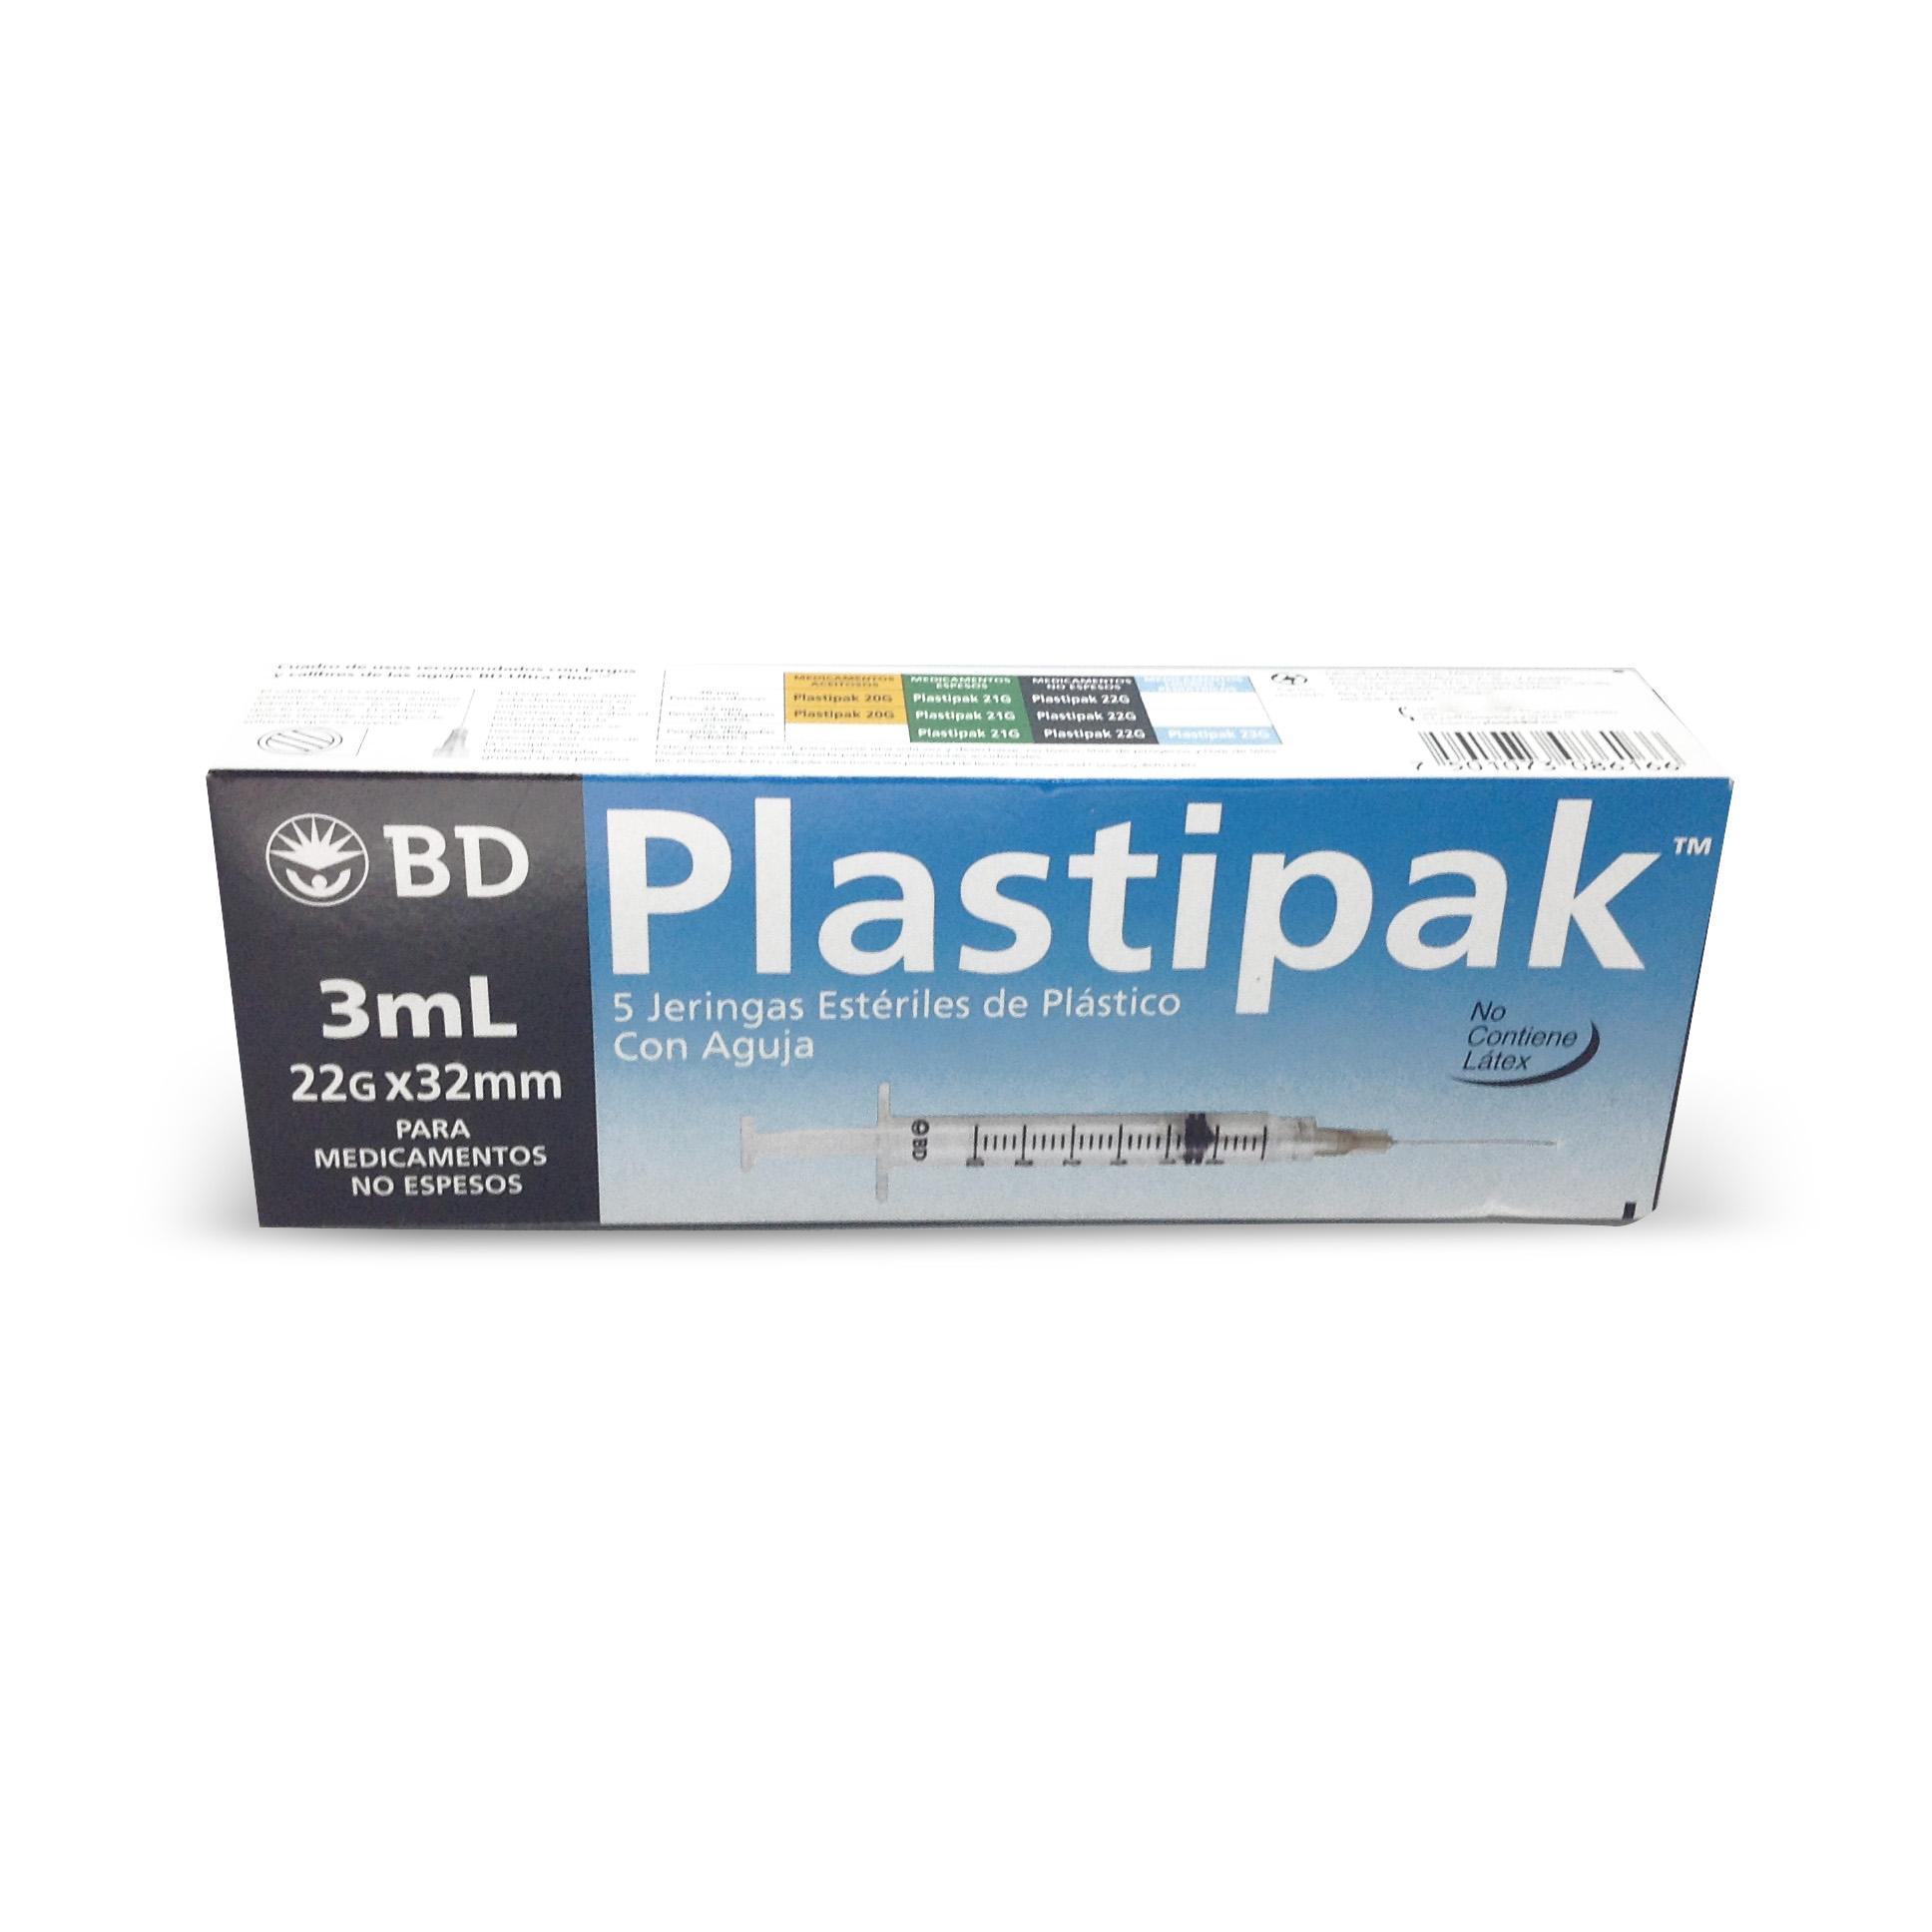 BD Plastipak 3ml 22g x 32mm